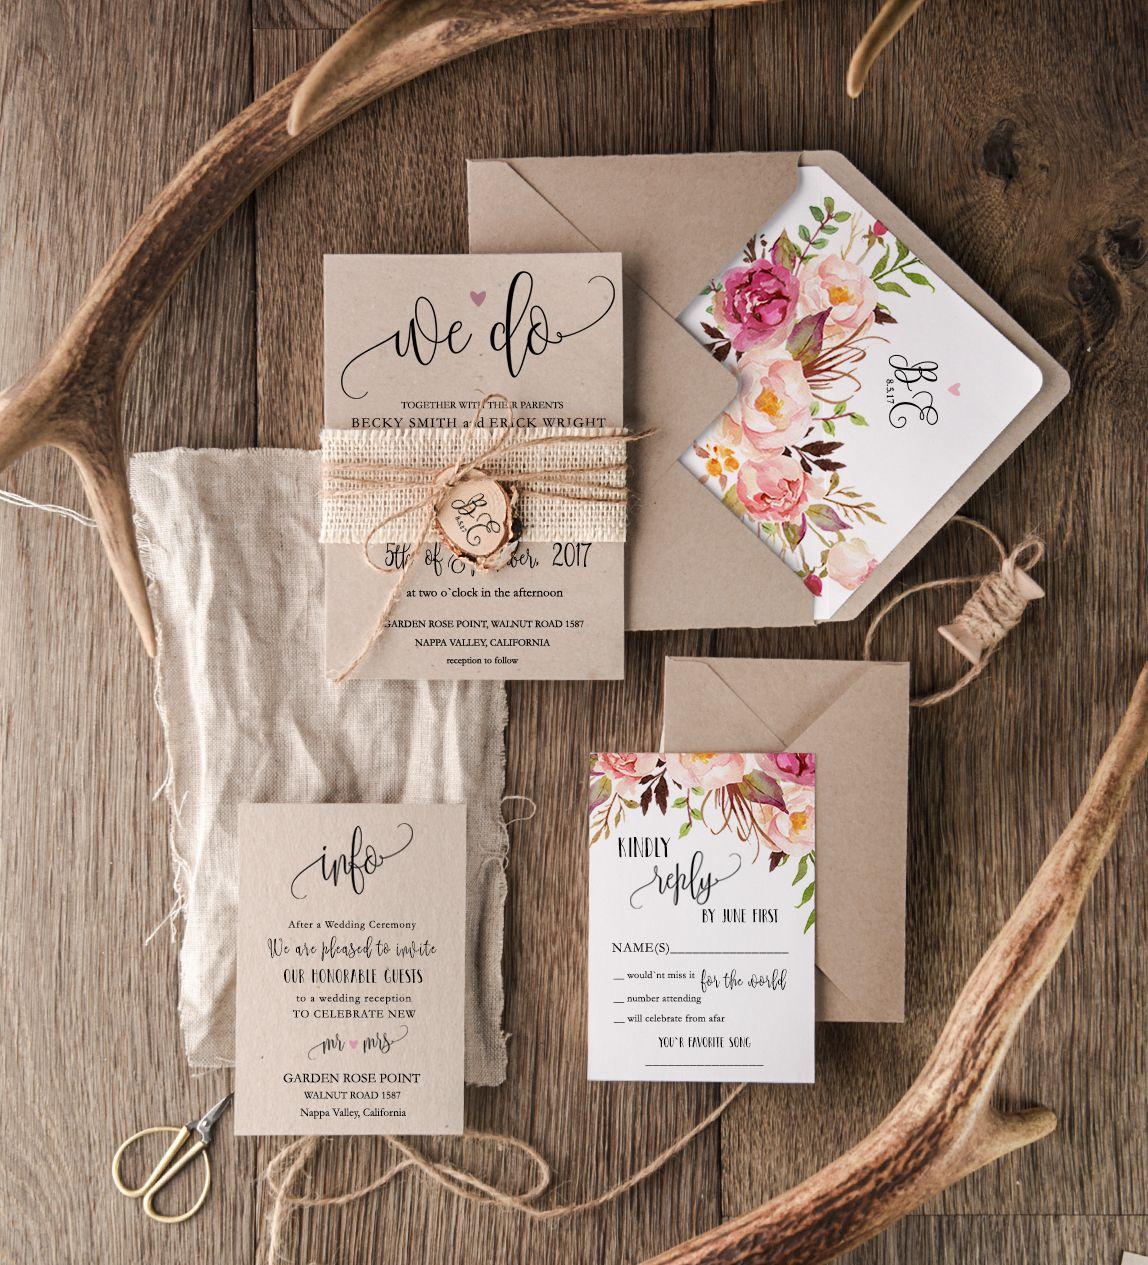 Wedding Invitations 001 Bccs Z Burlap Wedding Invitations Rustic Wedding Invitation Set Discount Wedding Invitations